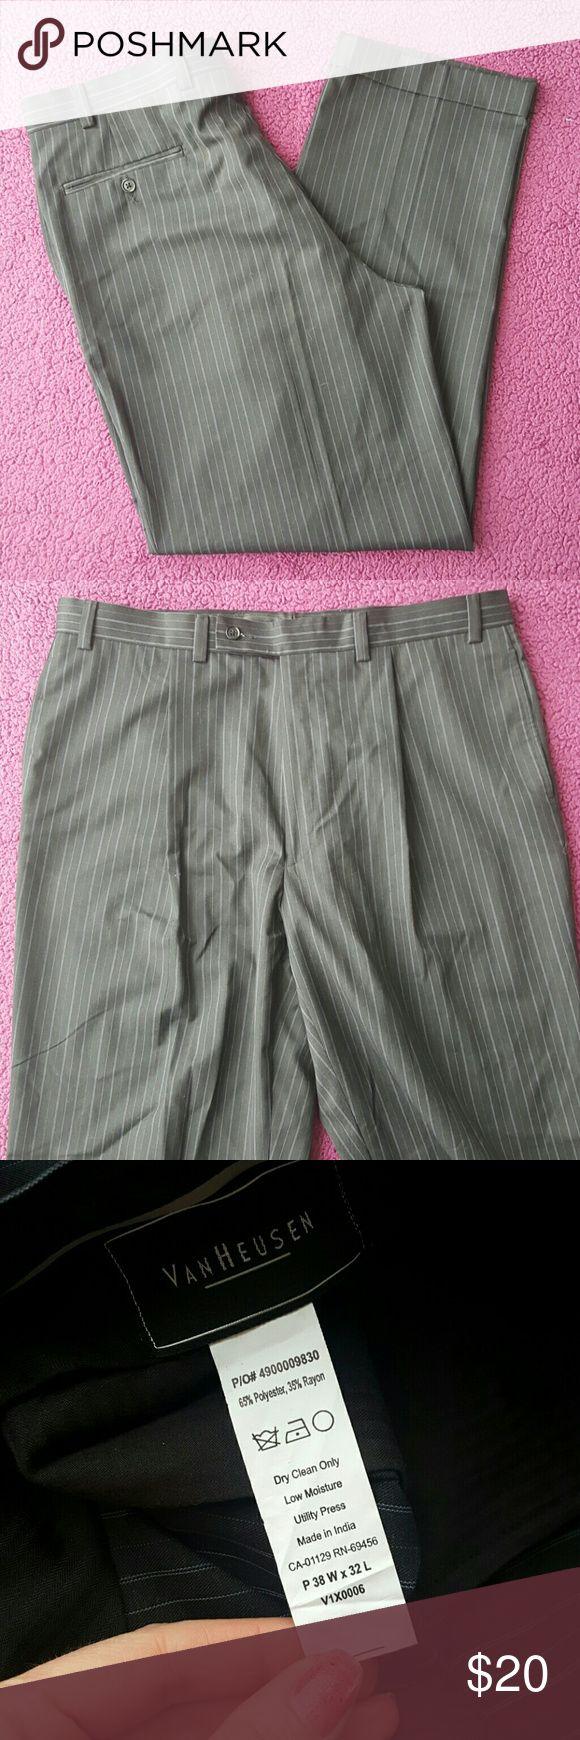 🌋Mens🌋slacks🌋 Size 38W 32L like new Van Heusen Pants Dress